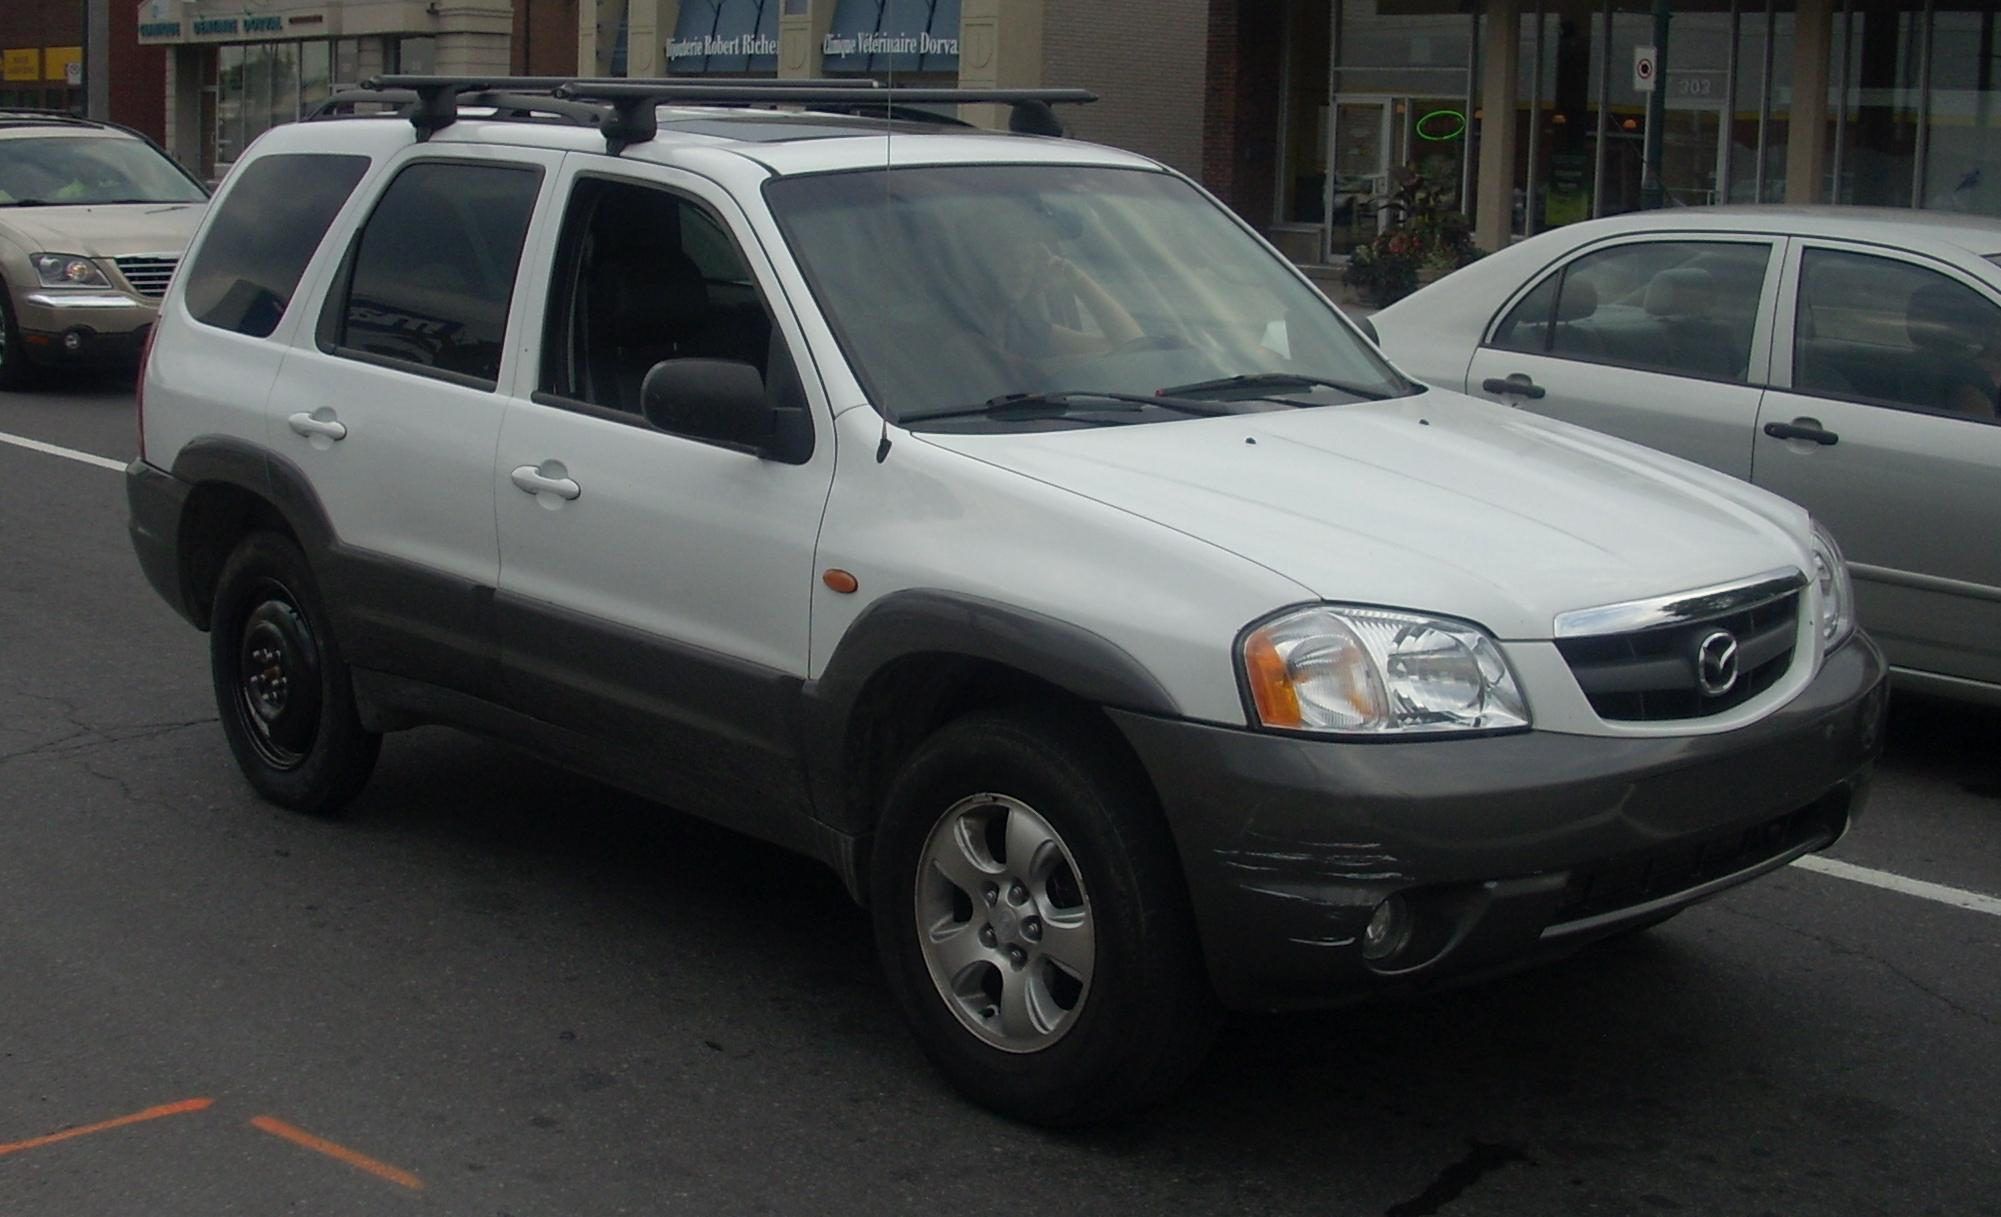 File:2001-04 Mazda Tribute.JPG - Wikimedia Commons